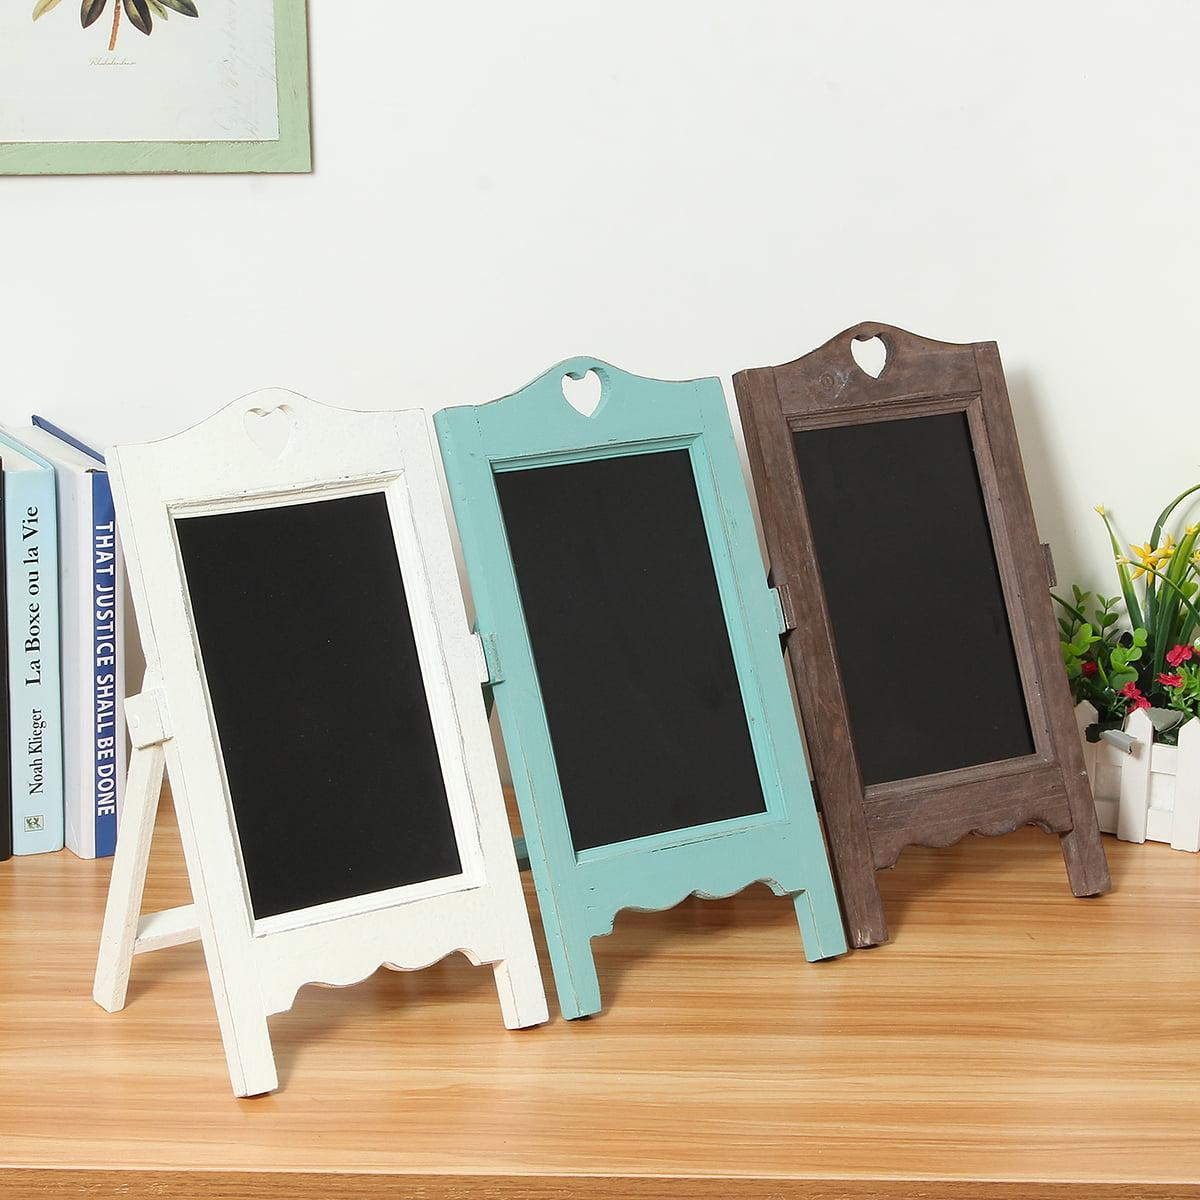 "4.9 x 7.7 x 13.8"" Vintage Chalk Board Blackboard Memo Message Board Wedding Kitchen Notes Signs"